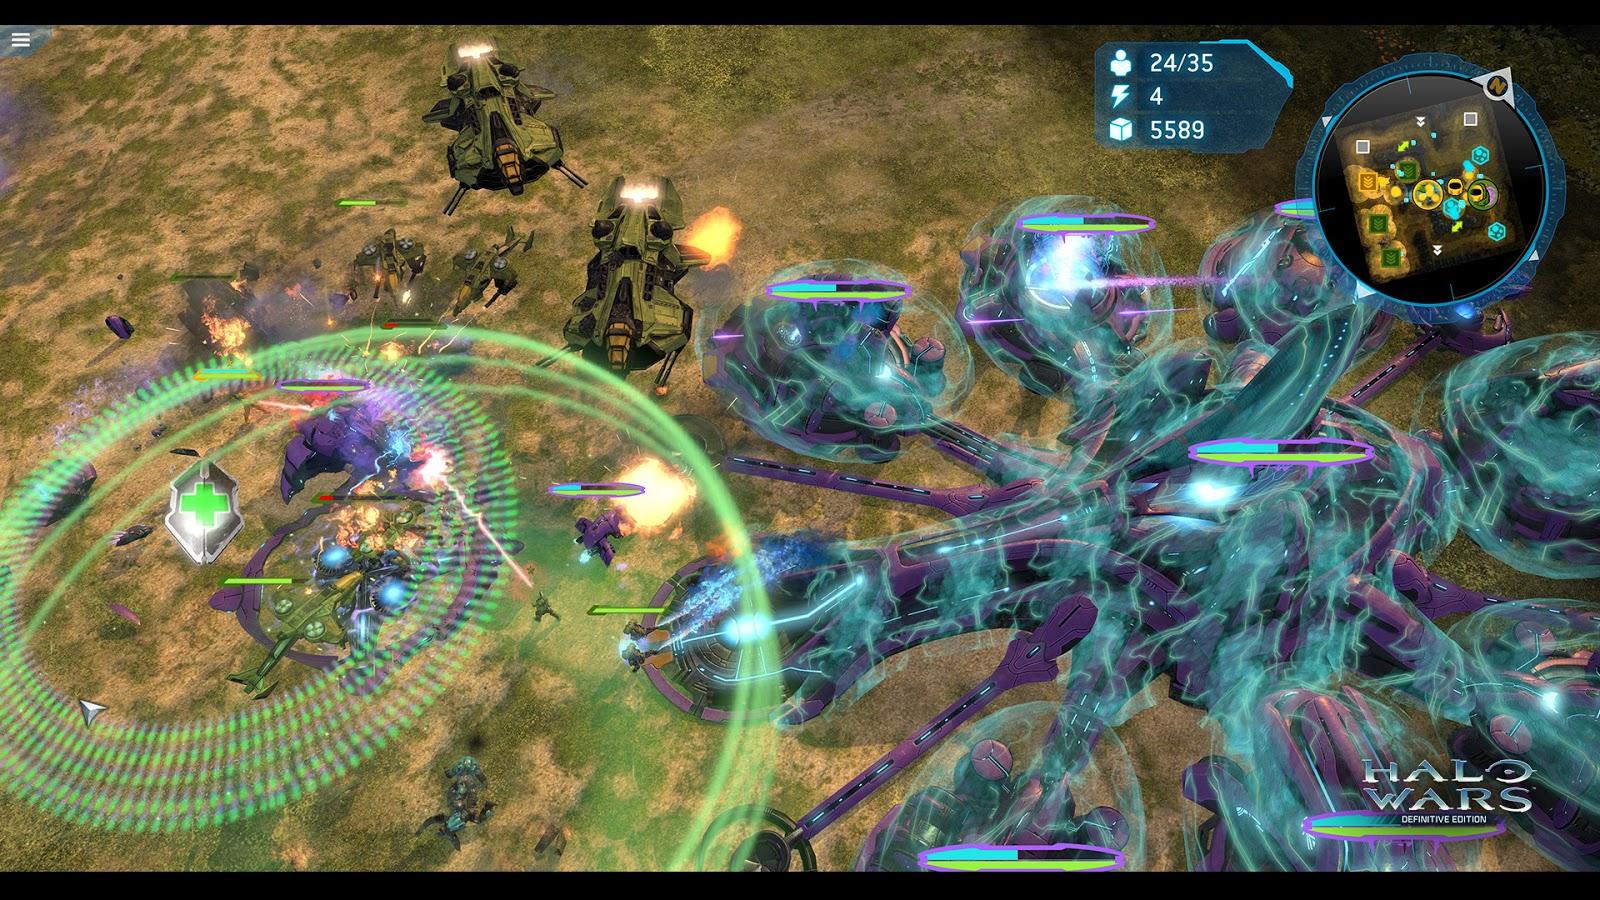 Halo Wars Definitive Edition ESPAÑOL PC Full + Hotfix 2 (CODEX) + REPACK 2 DVD5 (JPW) 9